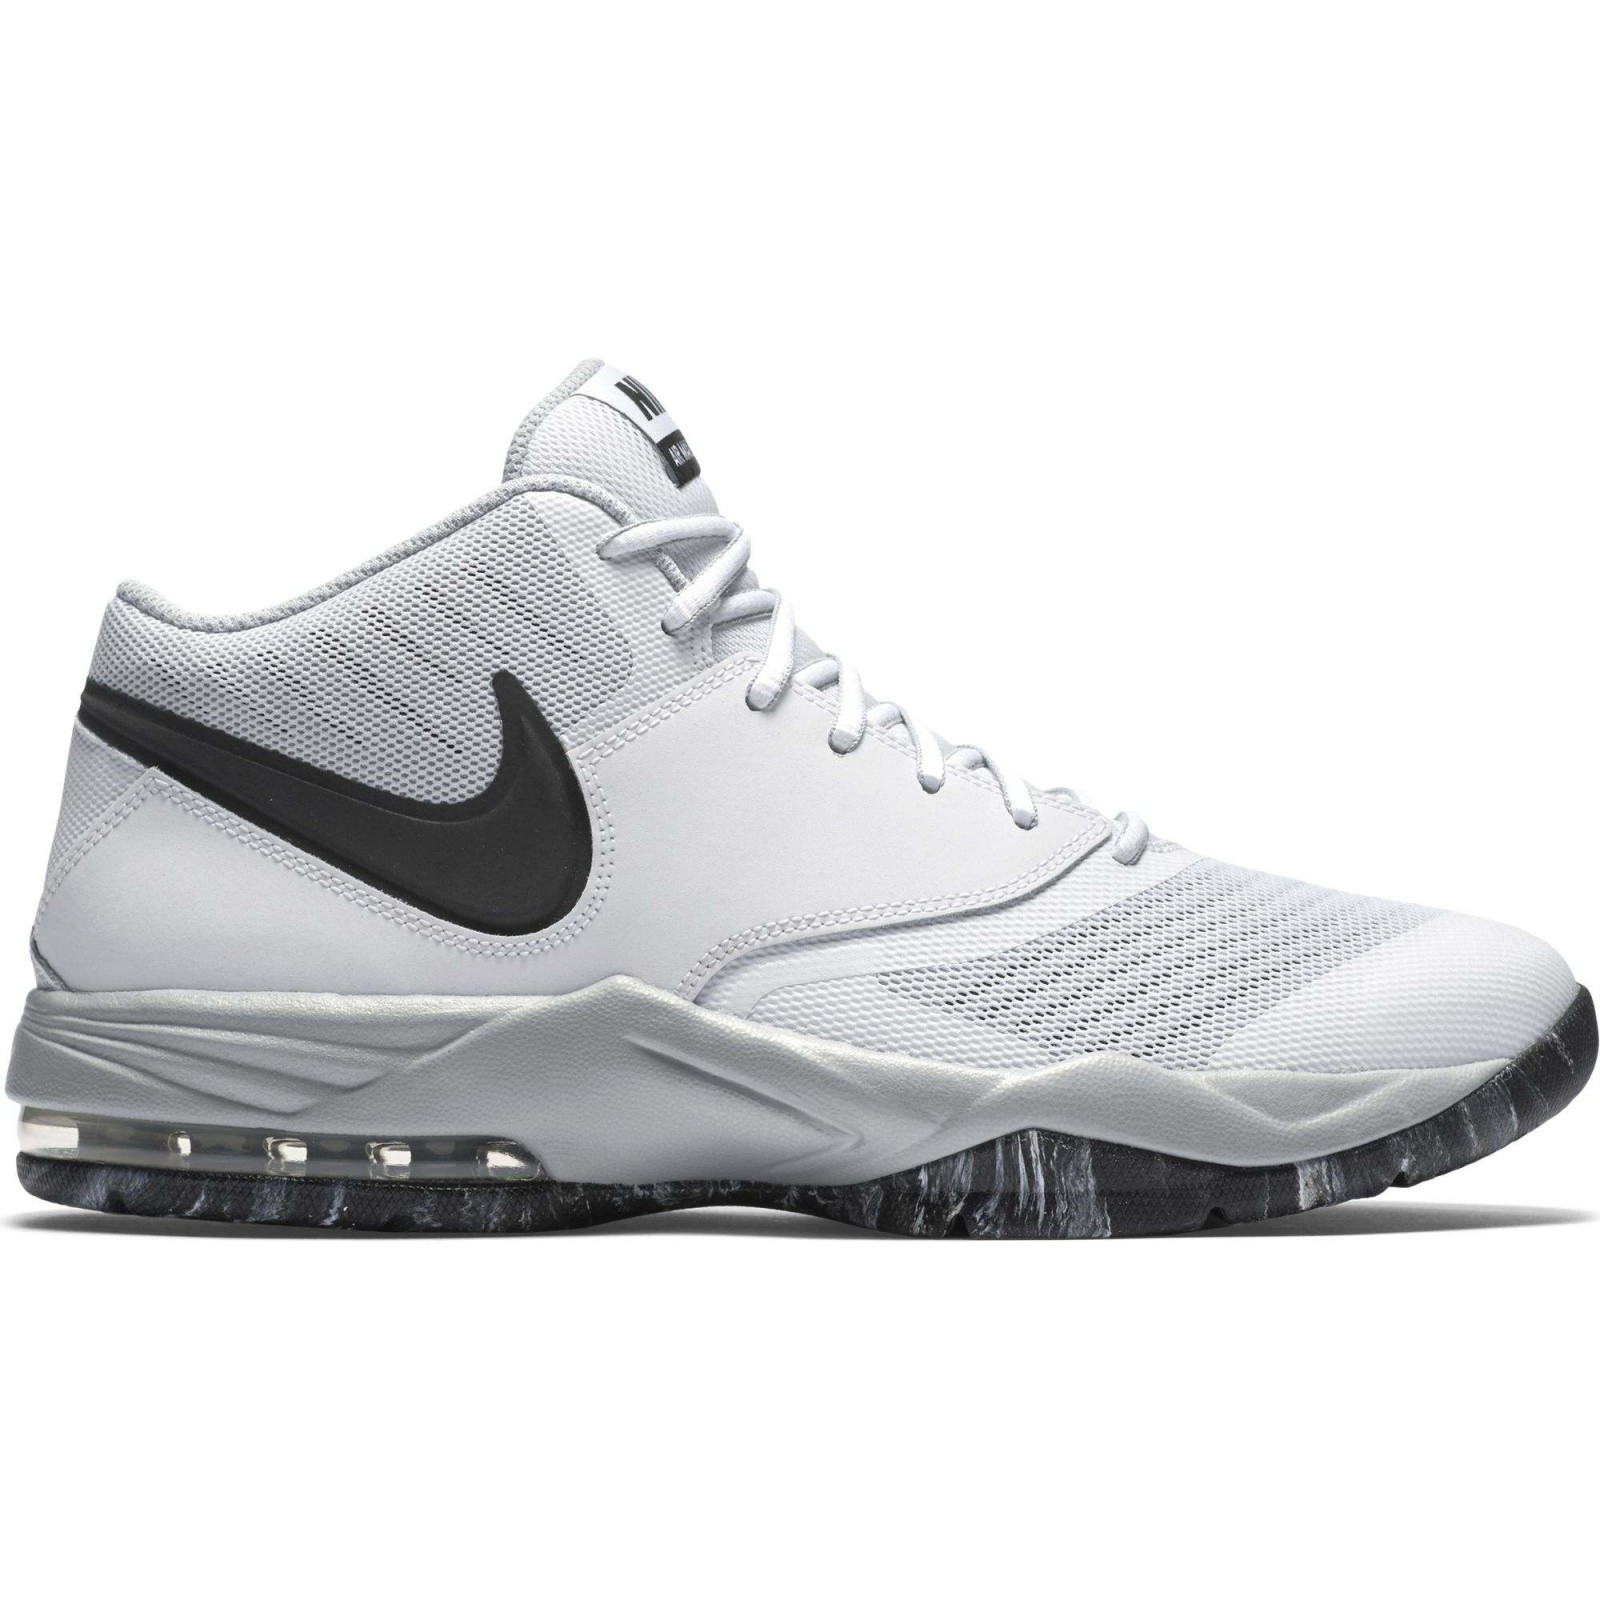 Pánské basketbalové boty Nike AIR MAX EMERGENT  4c0862669c3